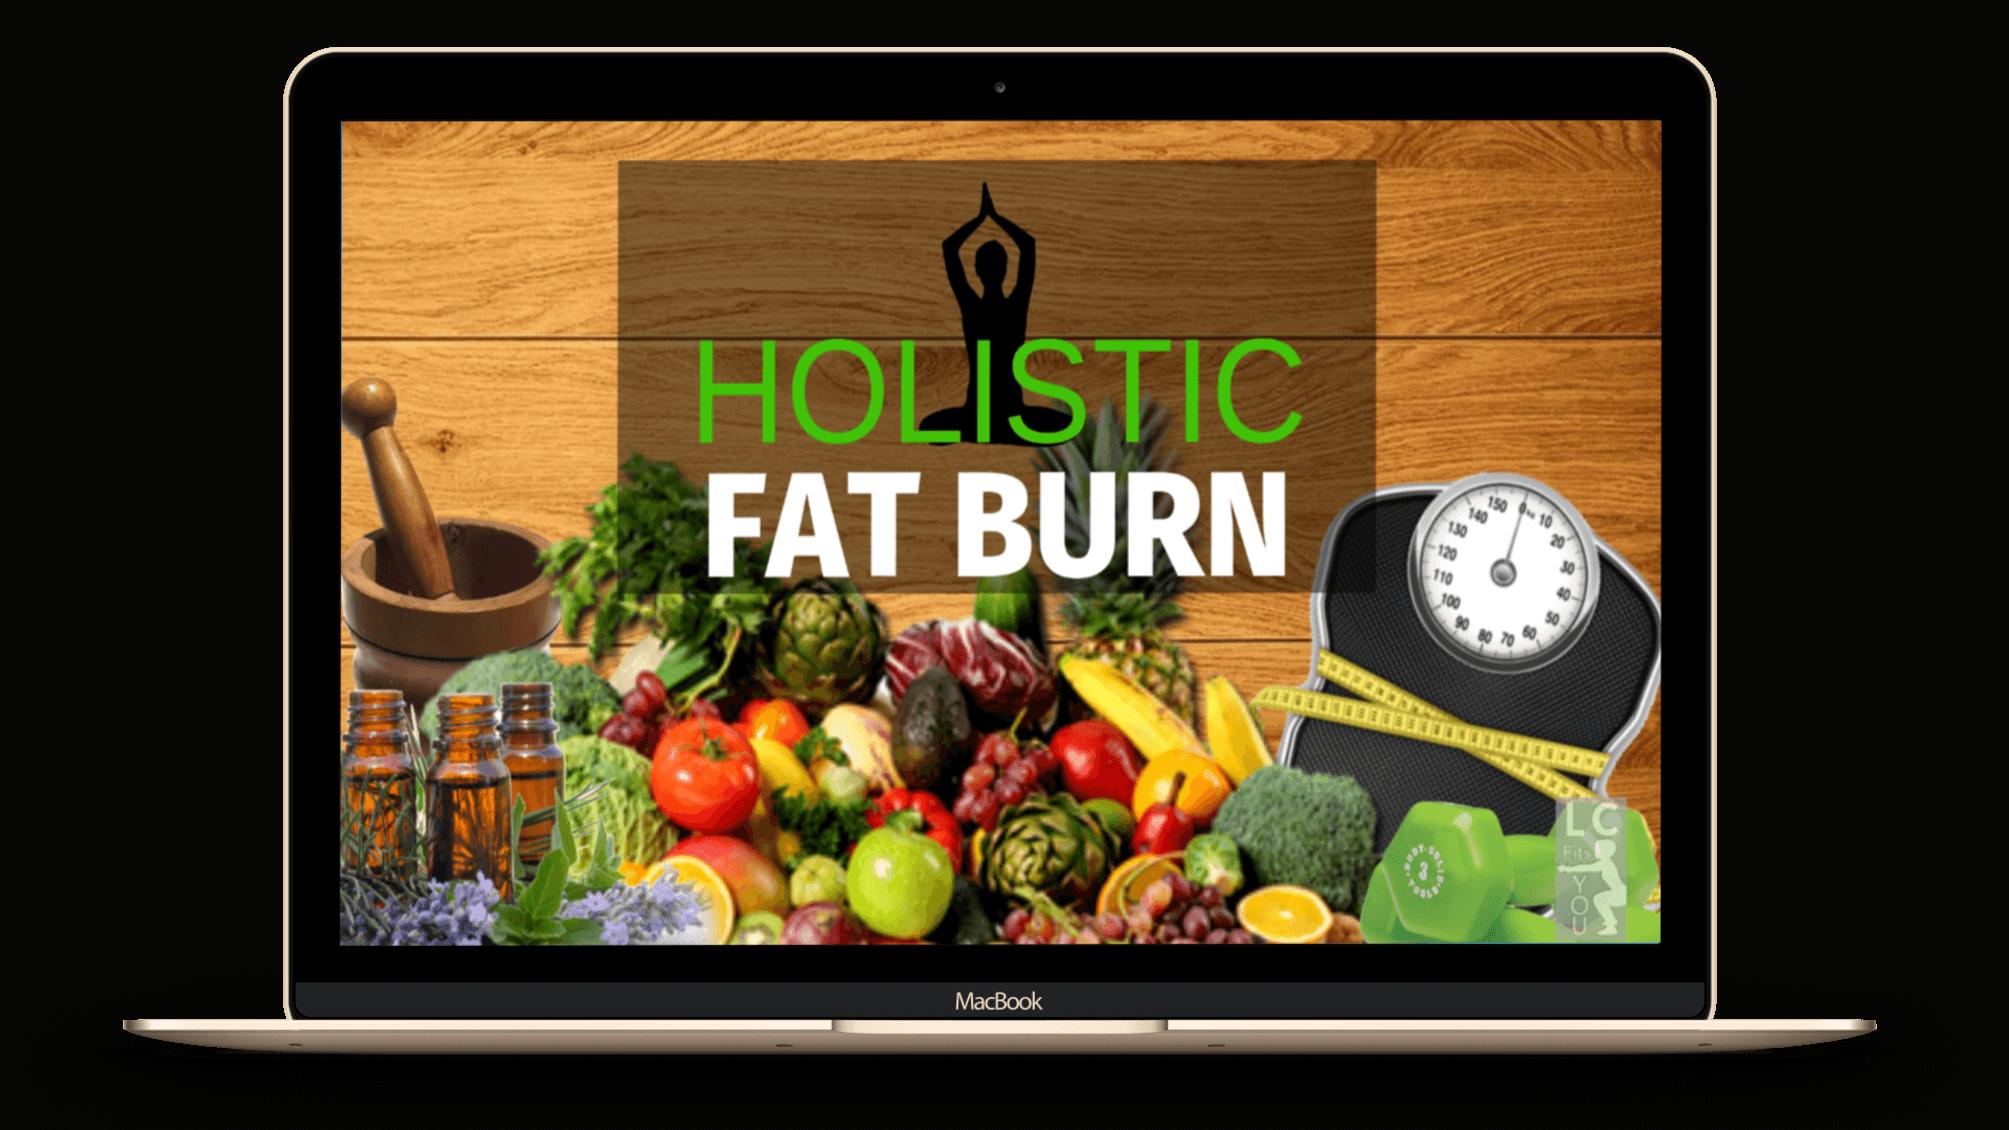 Holistic Fat Burn | Checkout